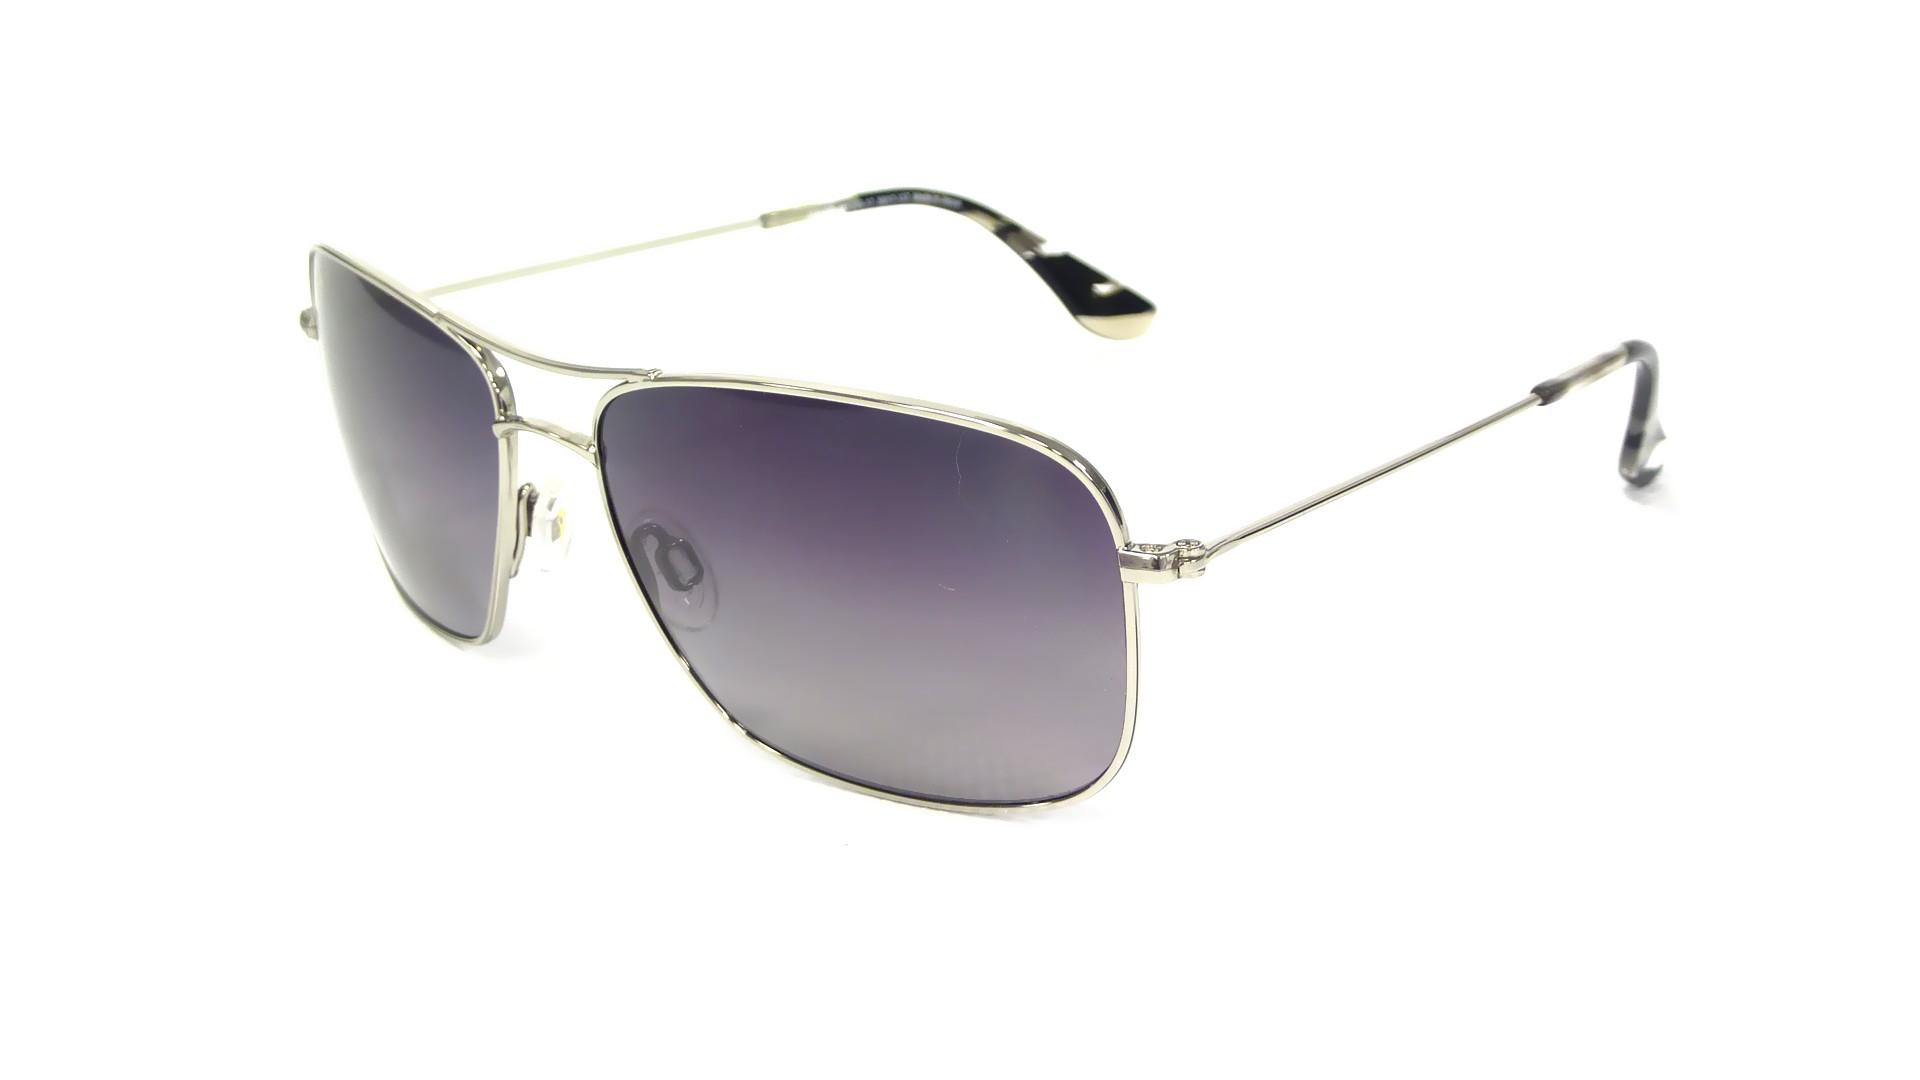 ce02a05678 Sunglasses Maui Jim Wiki wiki Silver GS246-17 59-17 Large Polarized